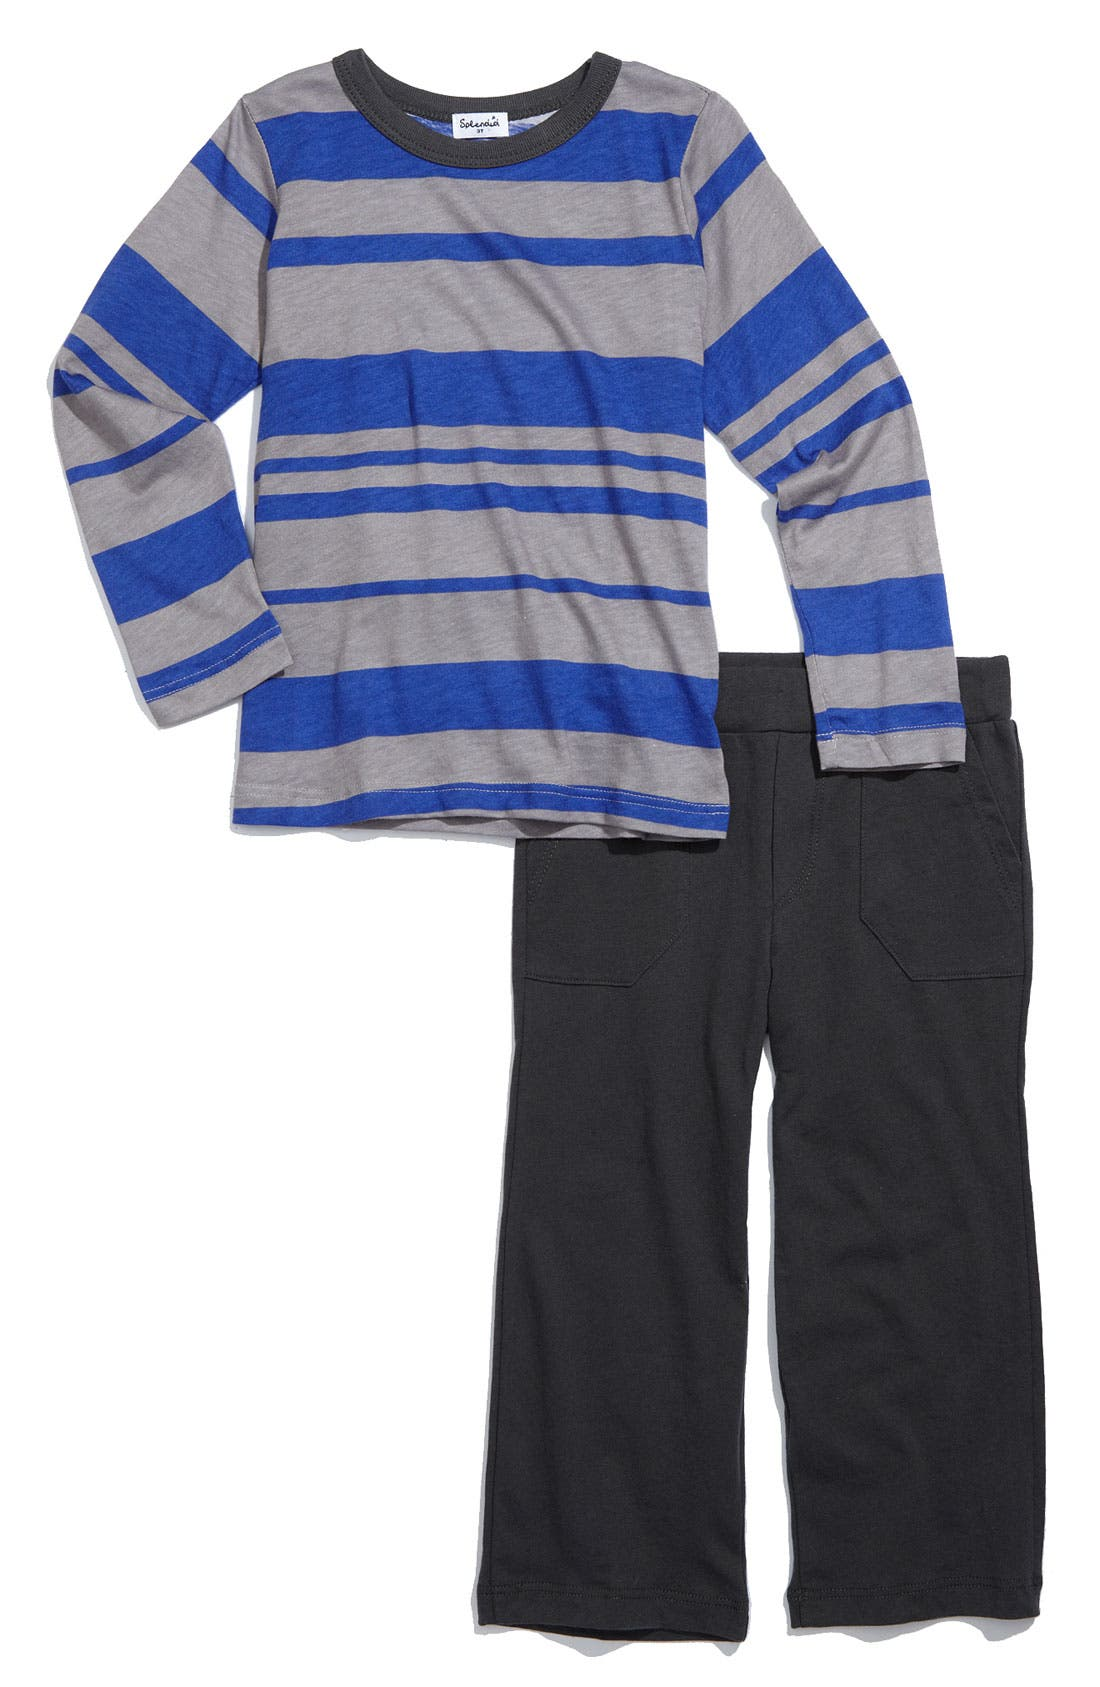 Alternate Image 1 Selected - Splendid 'Maritime Stripe' Shirt & Pants Set (Toddler)